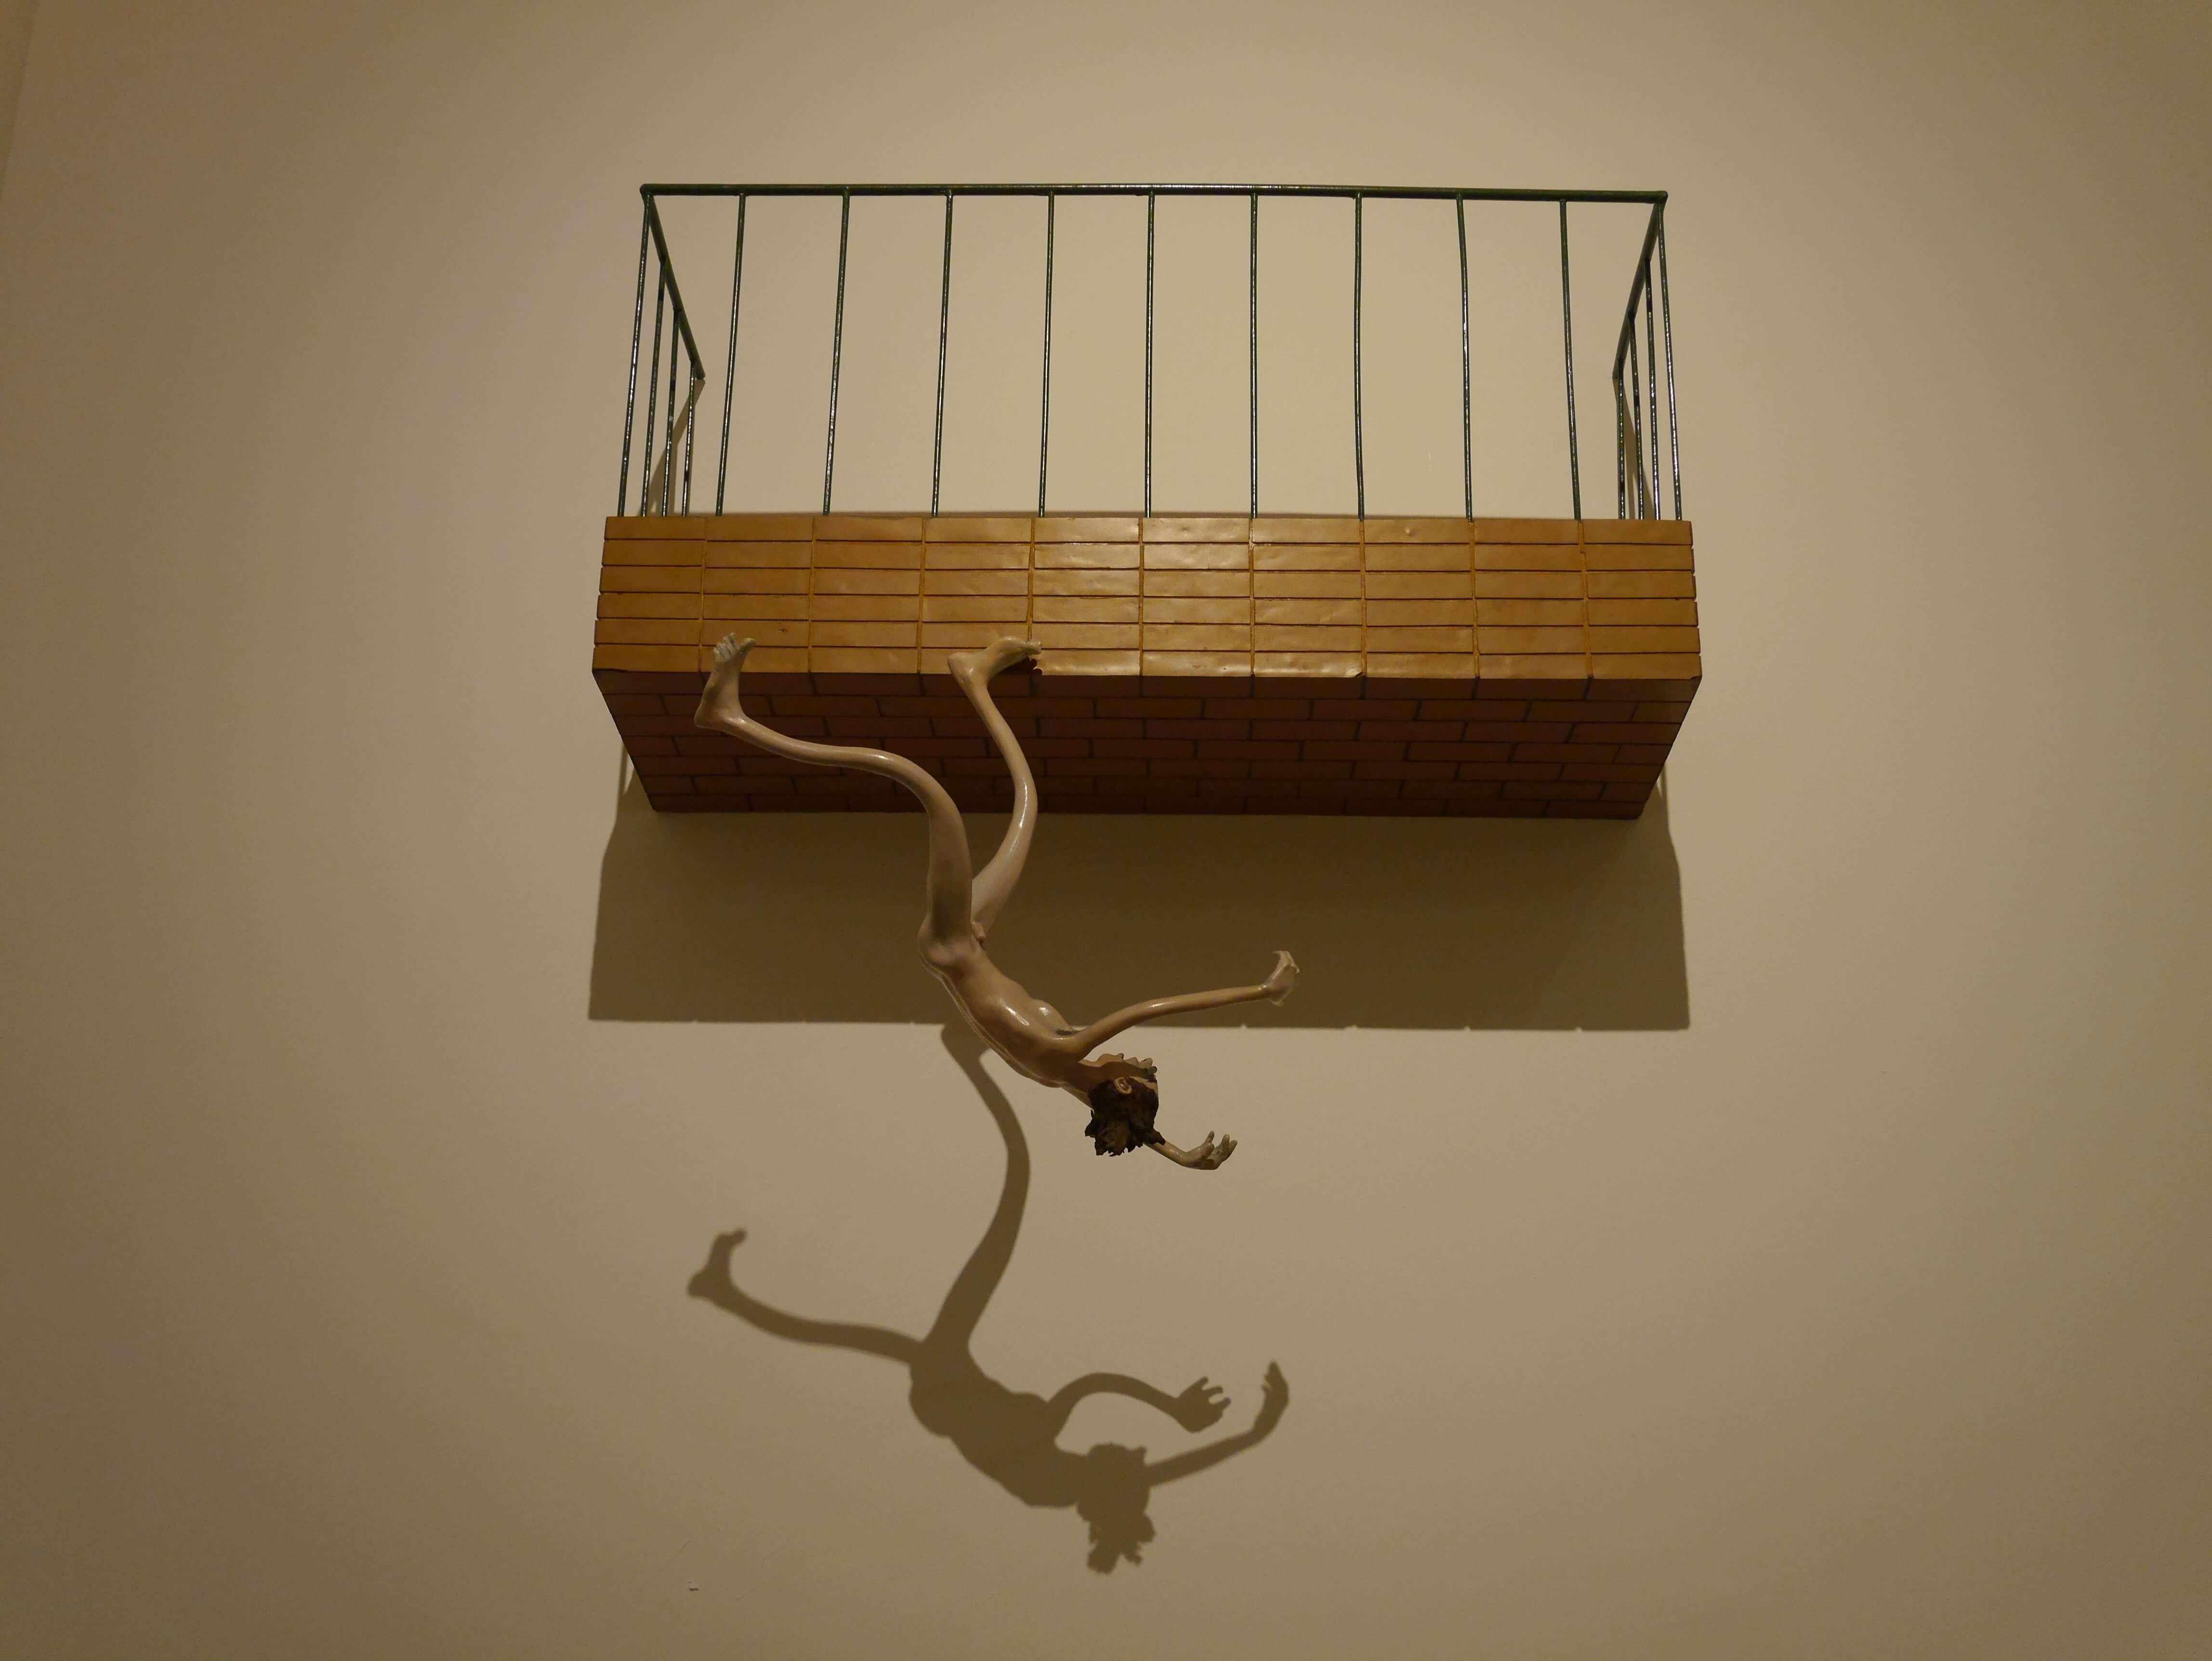 Pablo-Suárez-escultura-MALBA-Buenos-Aires